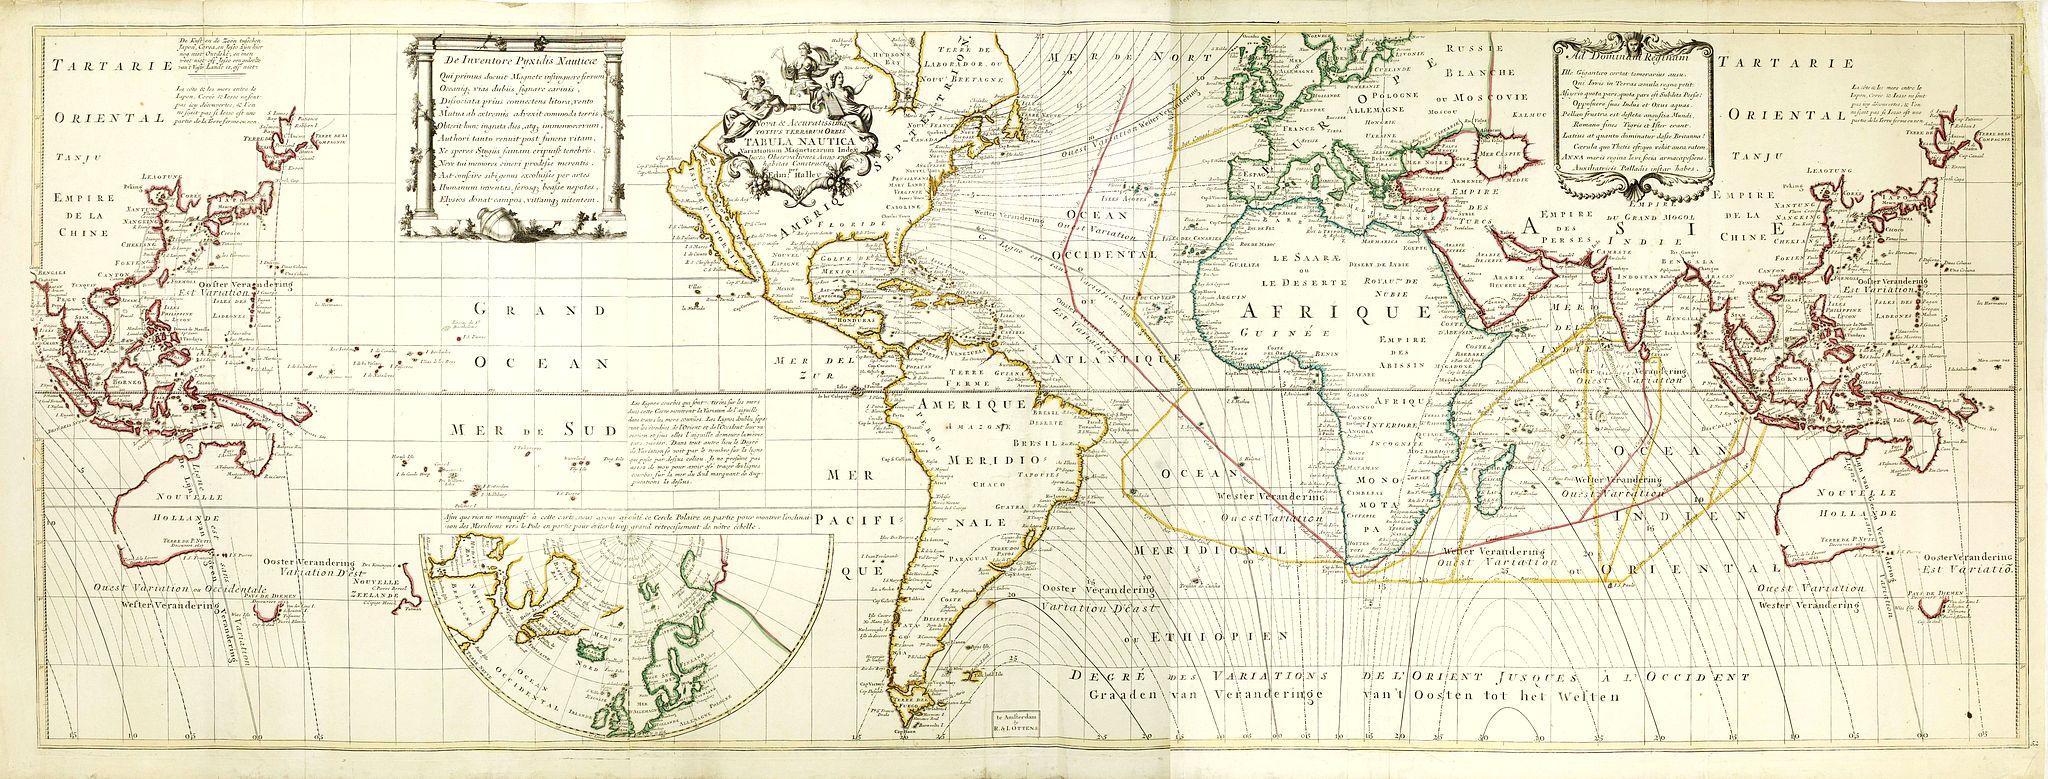 HALLEY,E. / OTTENS, J. & R. -  Nova & Accuratismia Totius Terrarum Tabula Nautica Variationum Magneticarum Index Juxta Obserations Anno 1706 habitas Constructa per Edm. Halley.